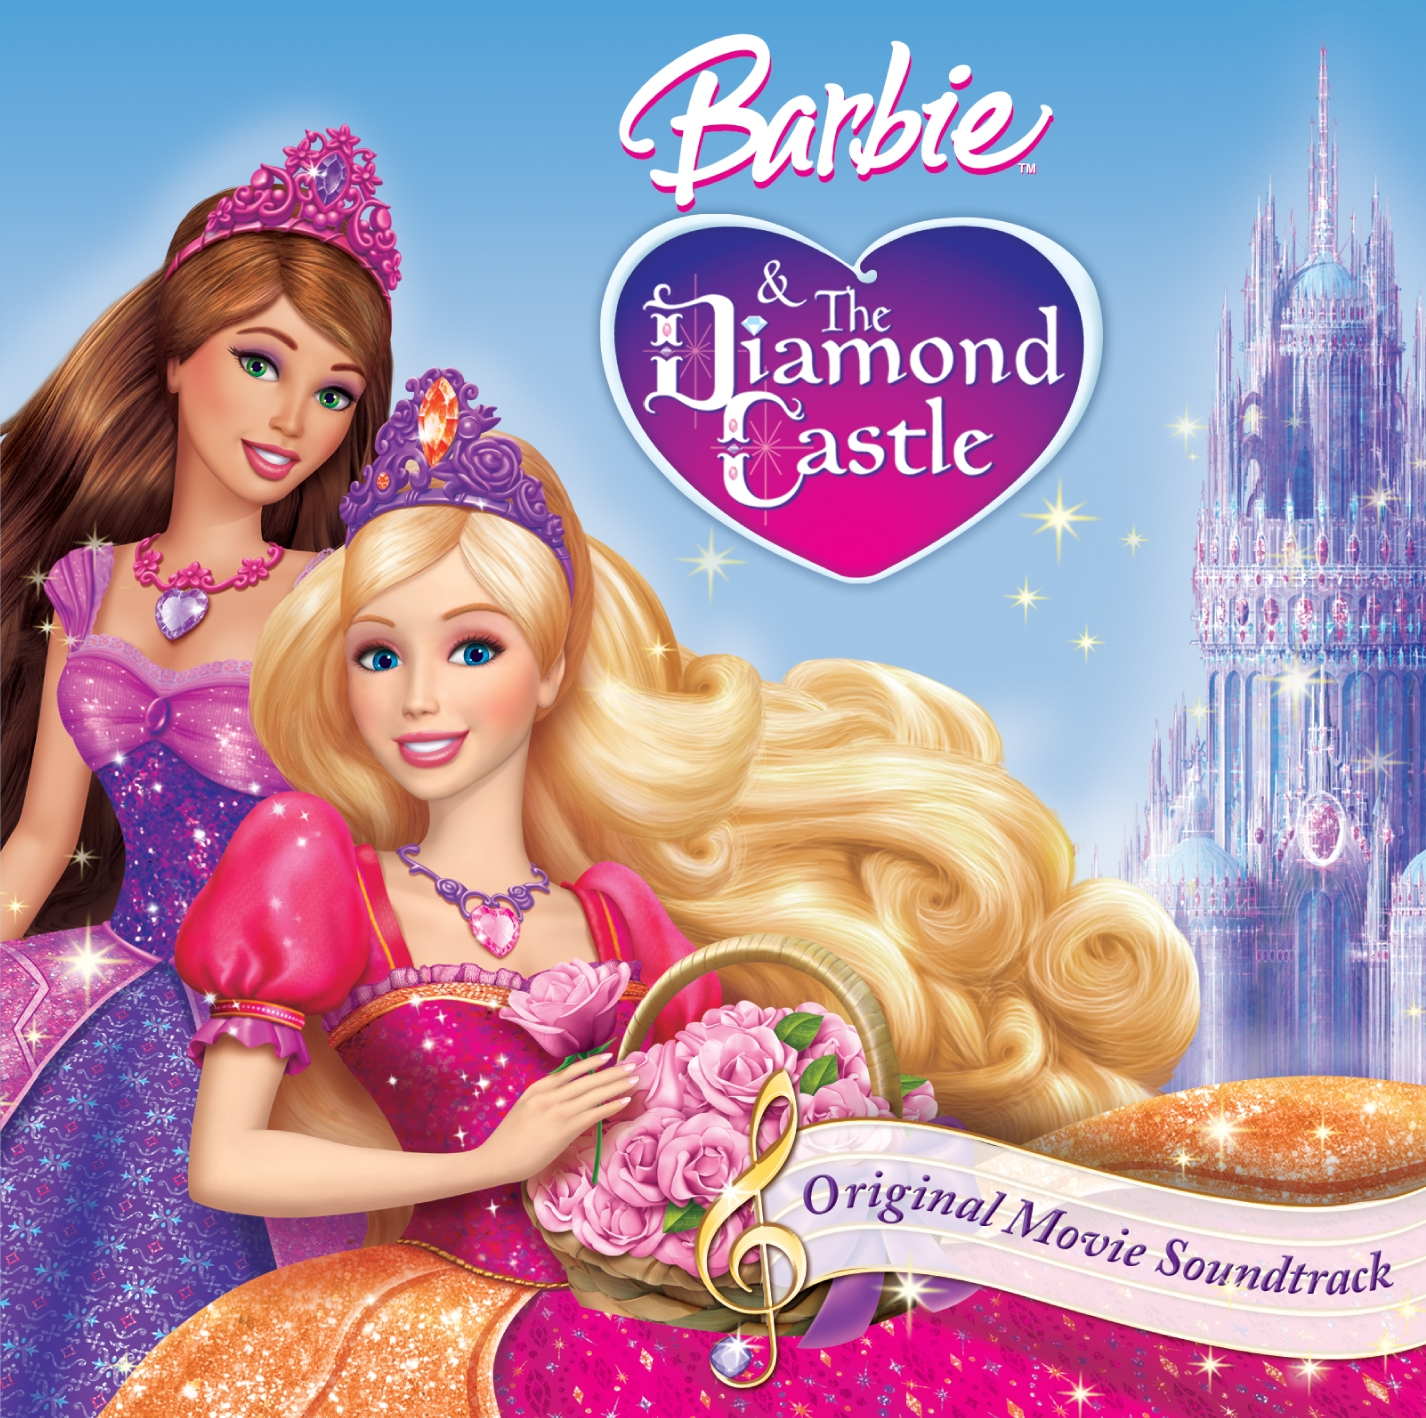 Most Inspiring Wallpaper Love Barbie - latest?cb\u003d20120723100754  Pic_573977.jpg/revision/latest?cb\u003d20120723100754